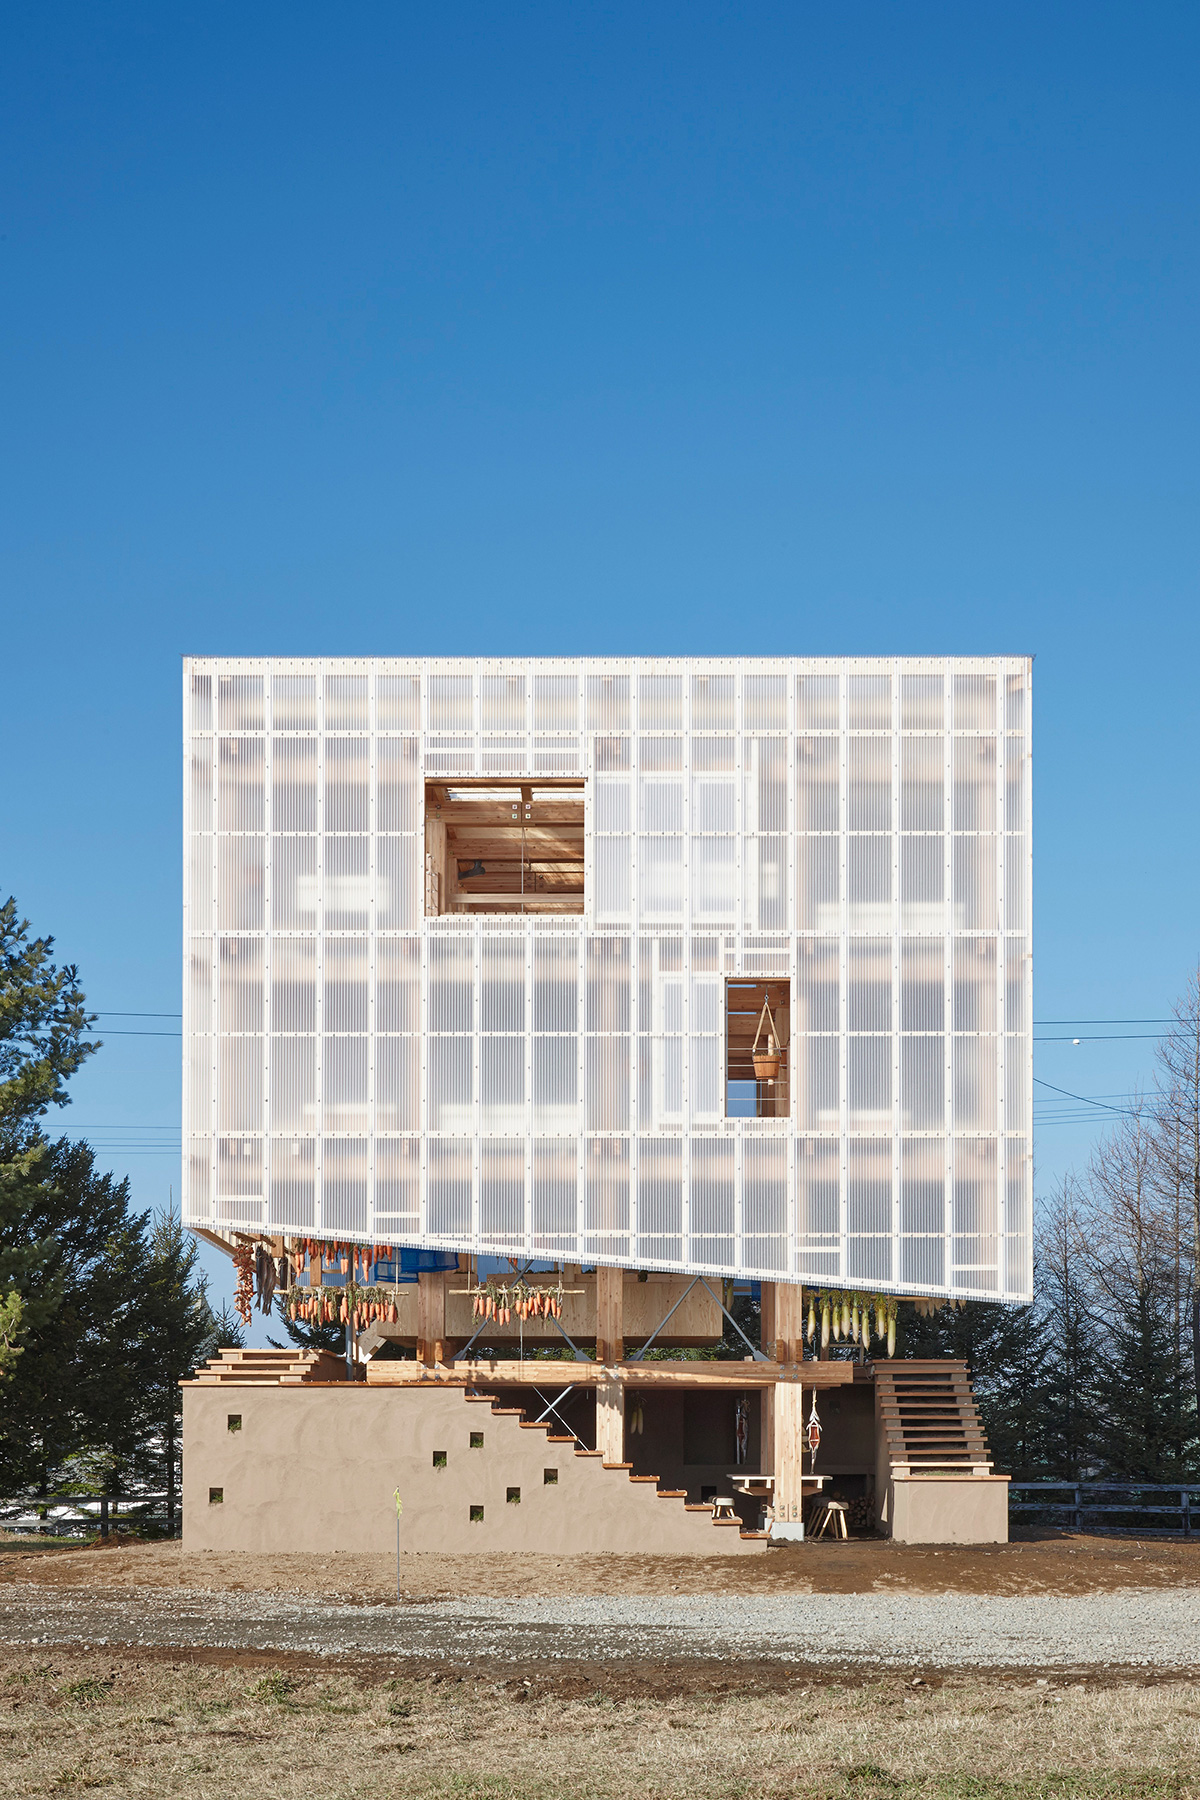 Nest We Grow / College of Environmental Design & Kengo Kuma & Associates (41)